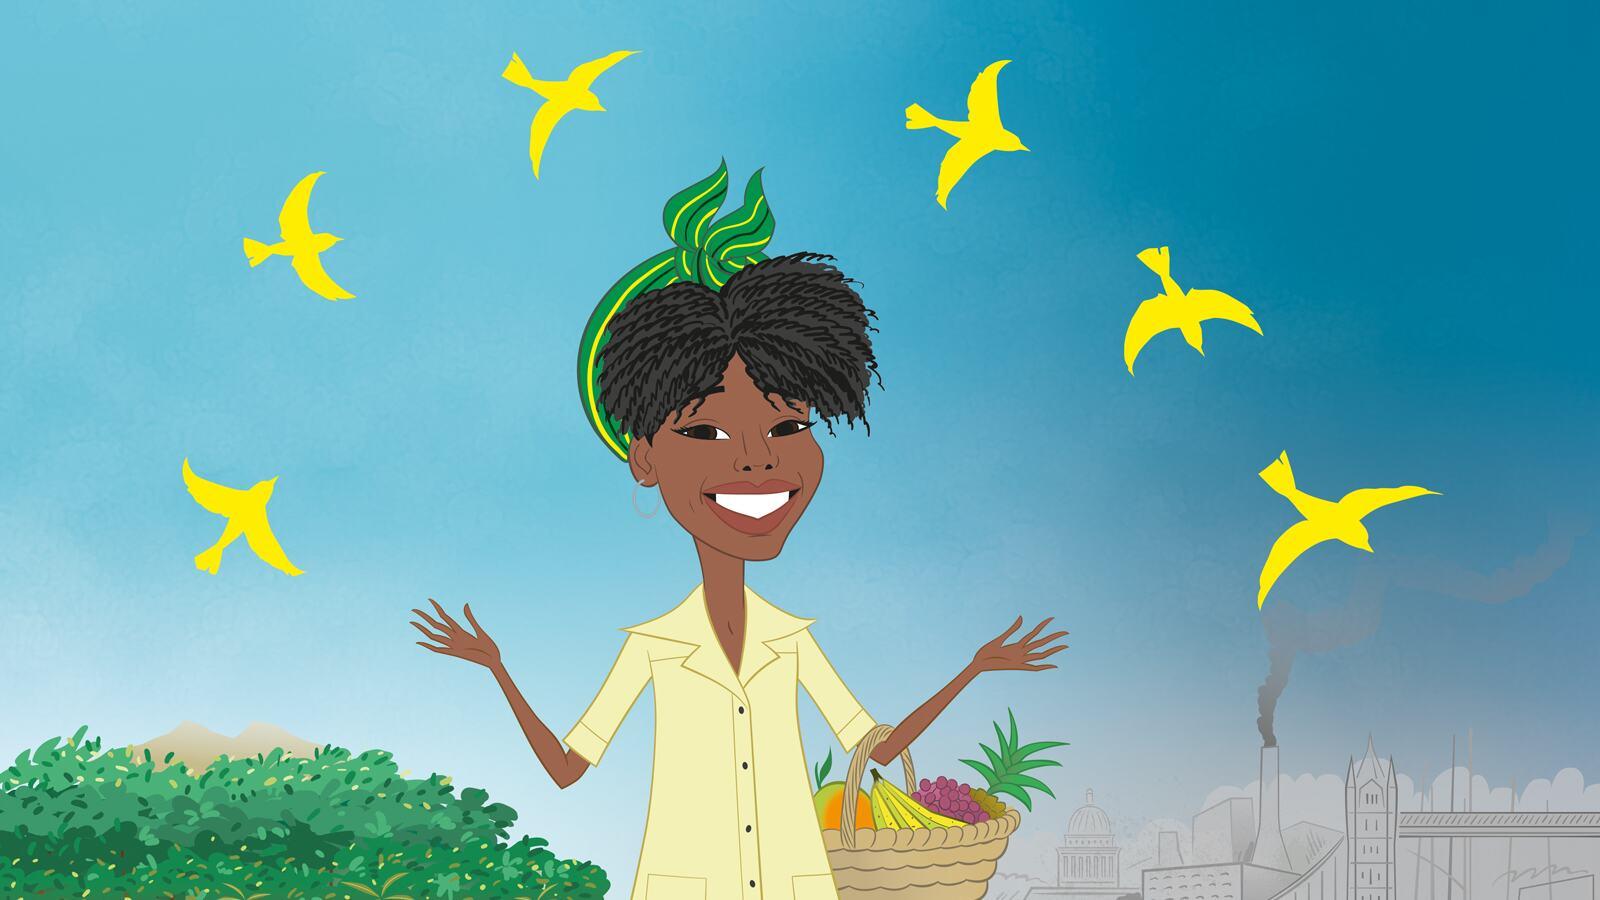 Evelyn & The Yellow Birds, illustration